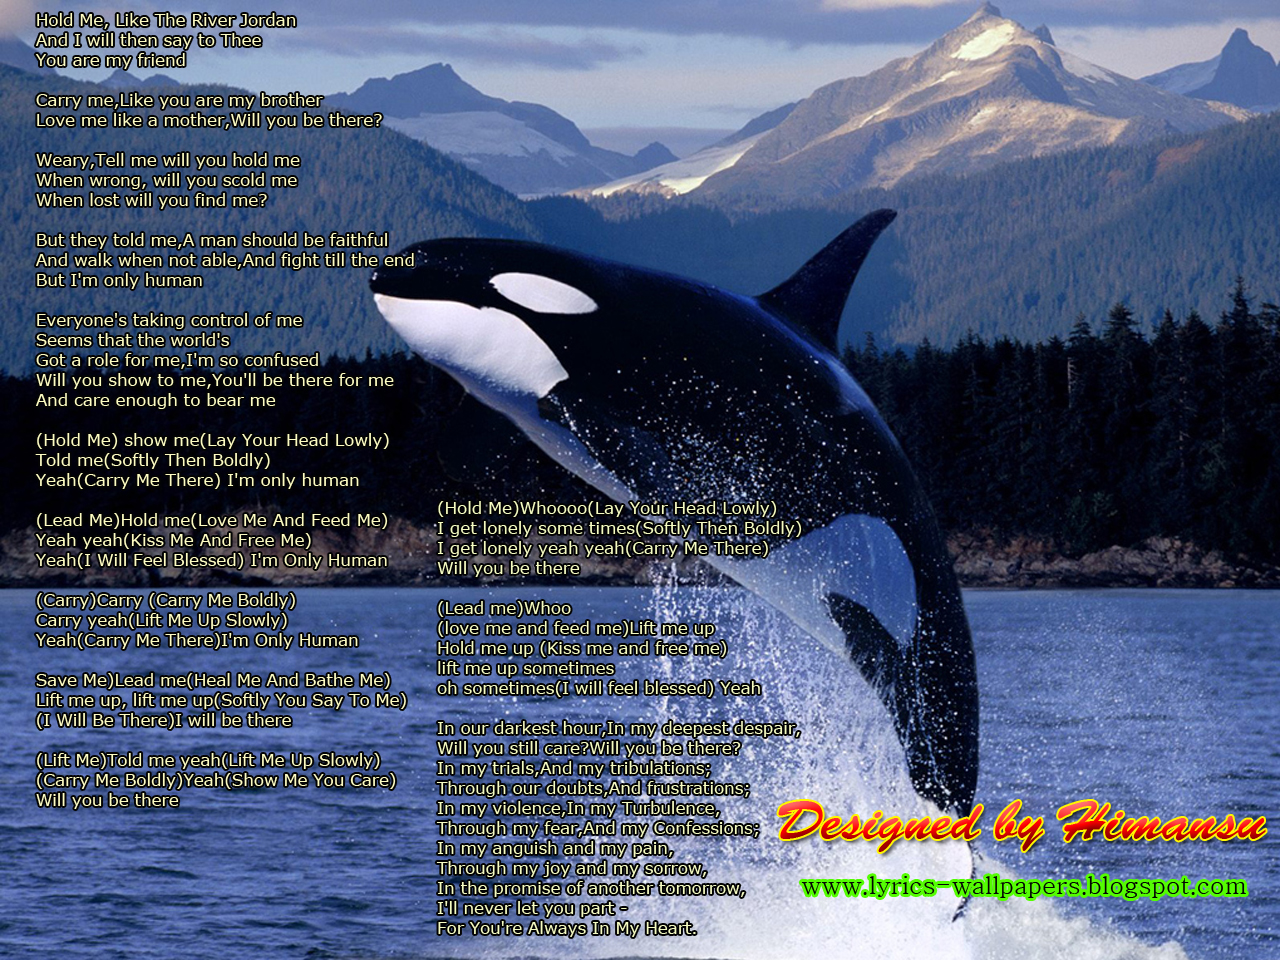 Free download Lyrics Wallpapers Michael Jackson Will You Be